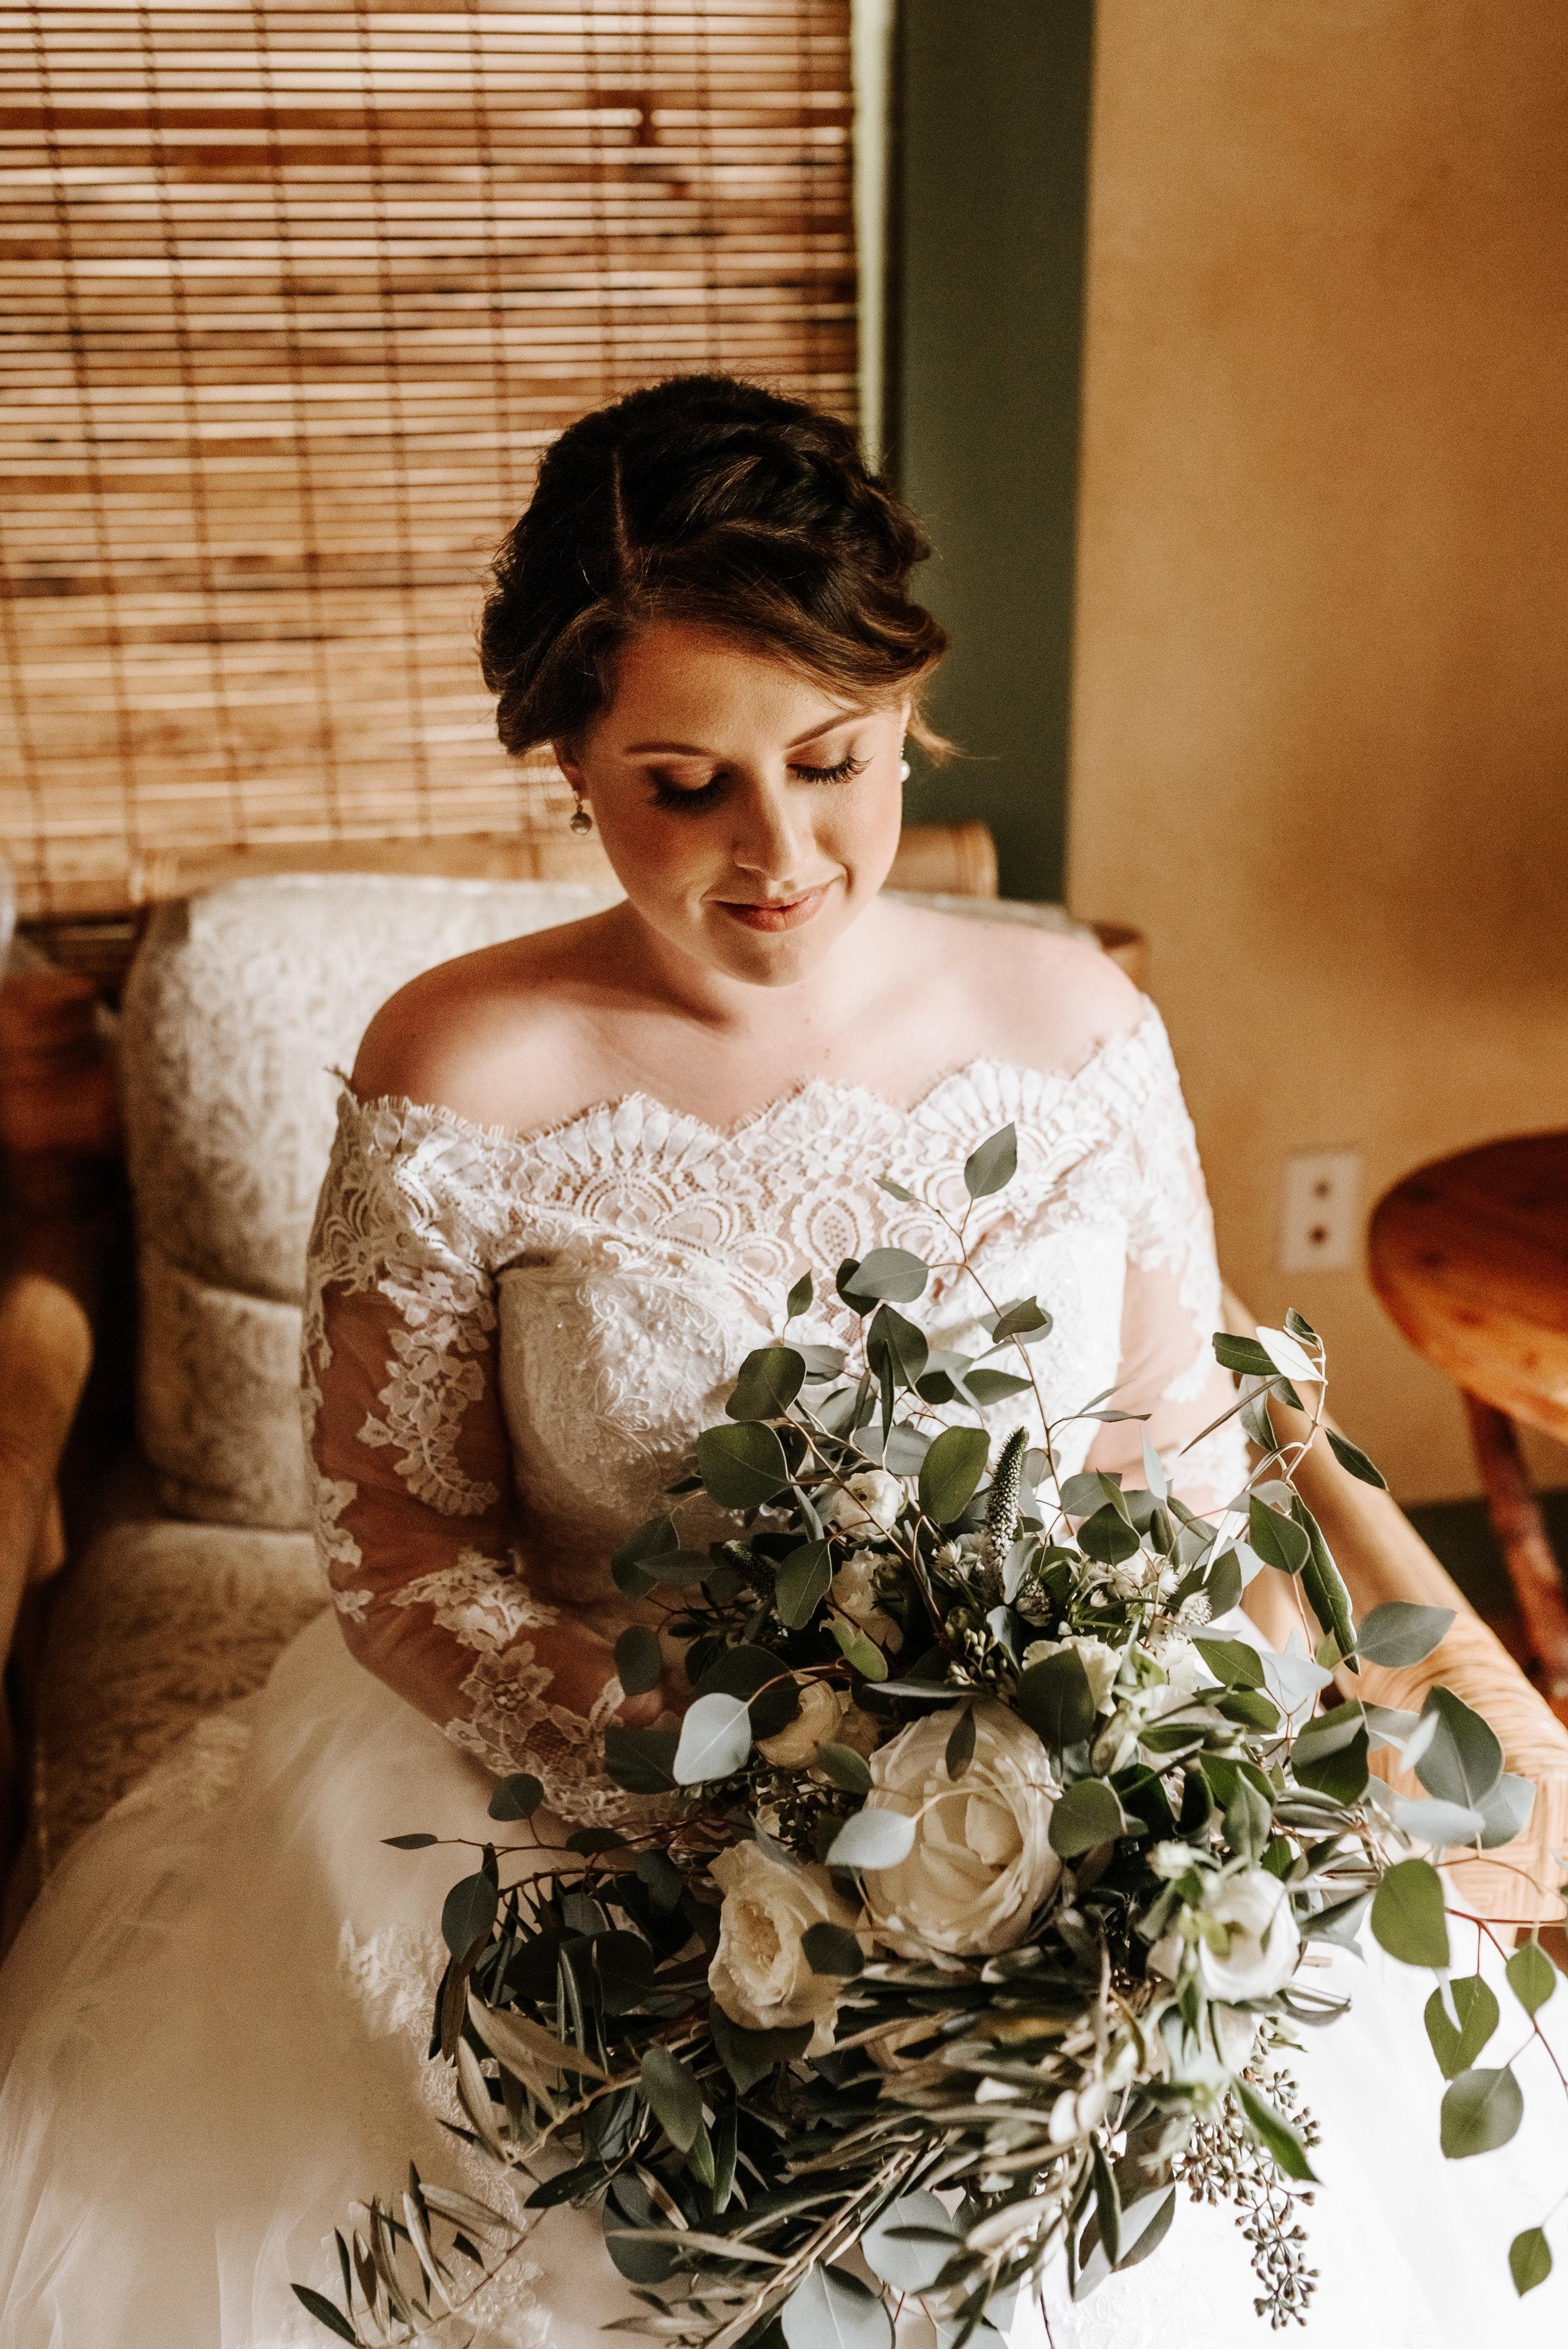 Madison-Chapman-Wedding-The-Sunday-House-Delray-Beach-Photography-by-V-4832.jpg